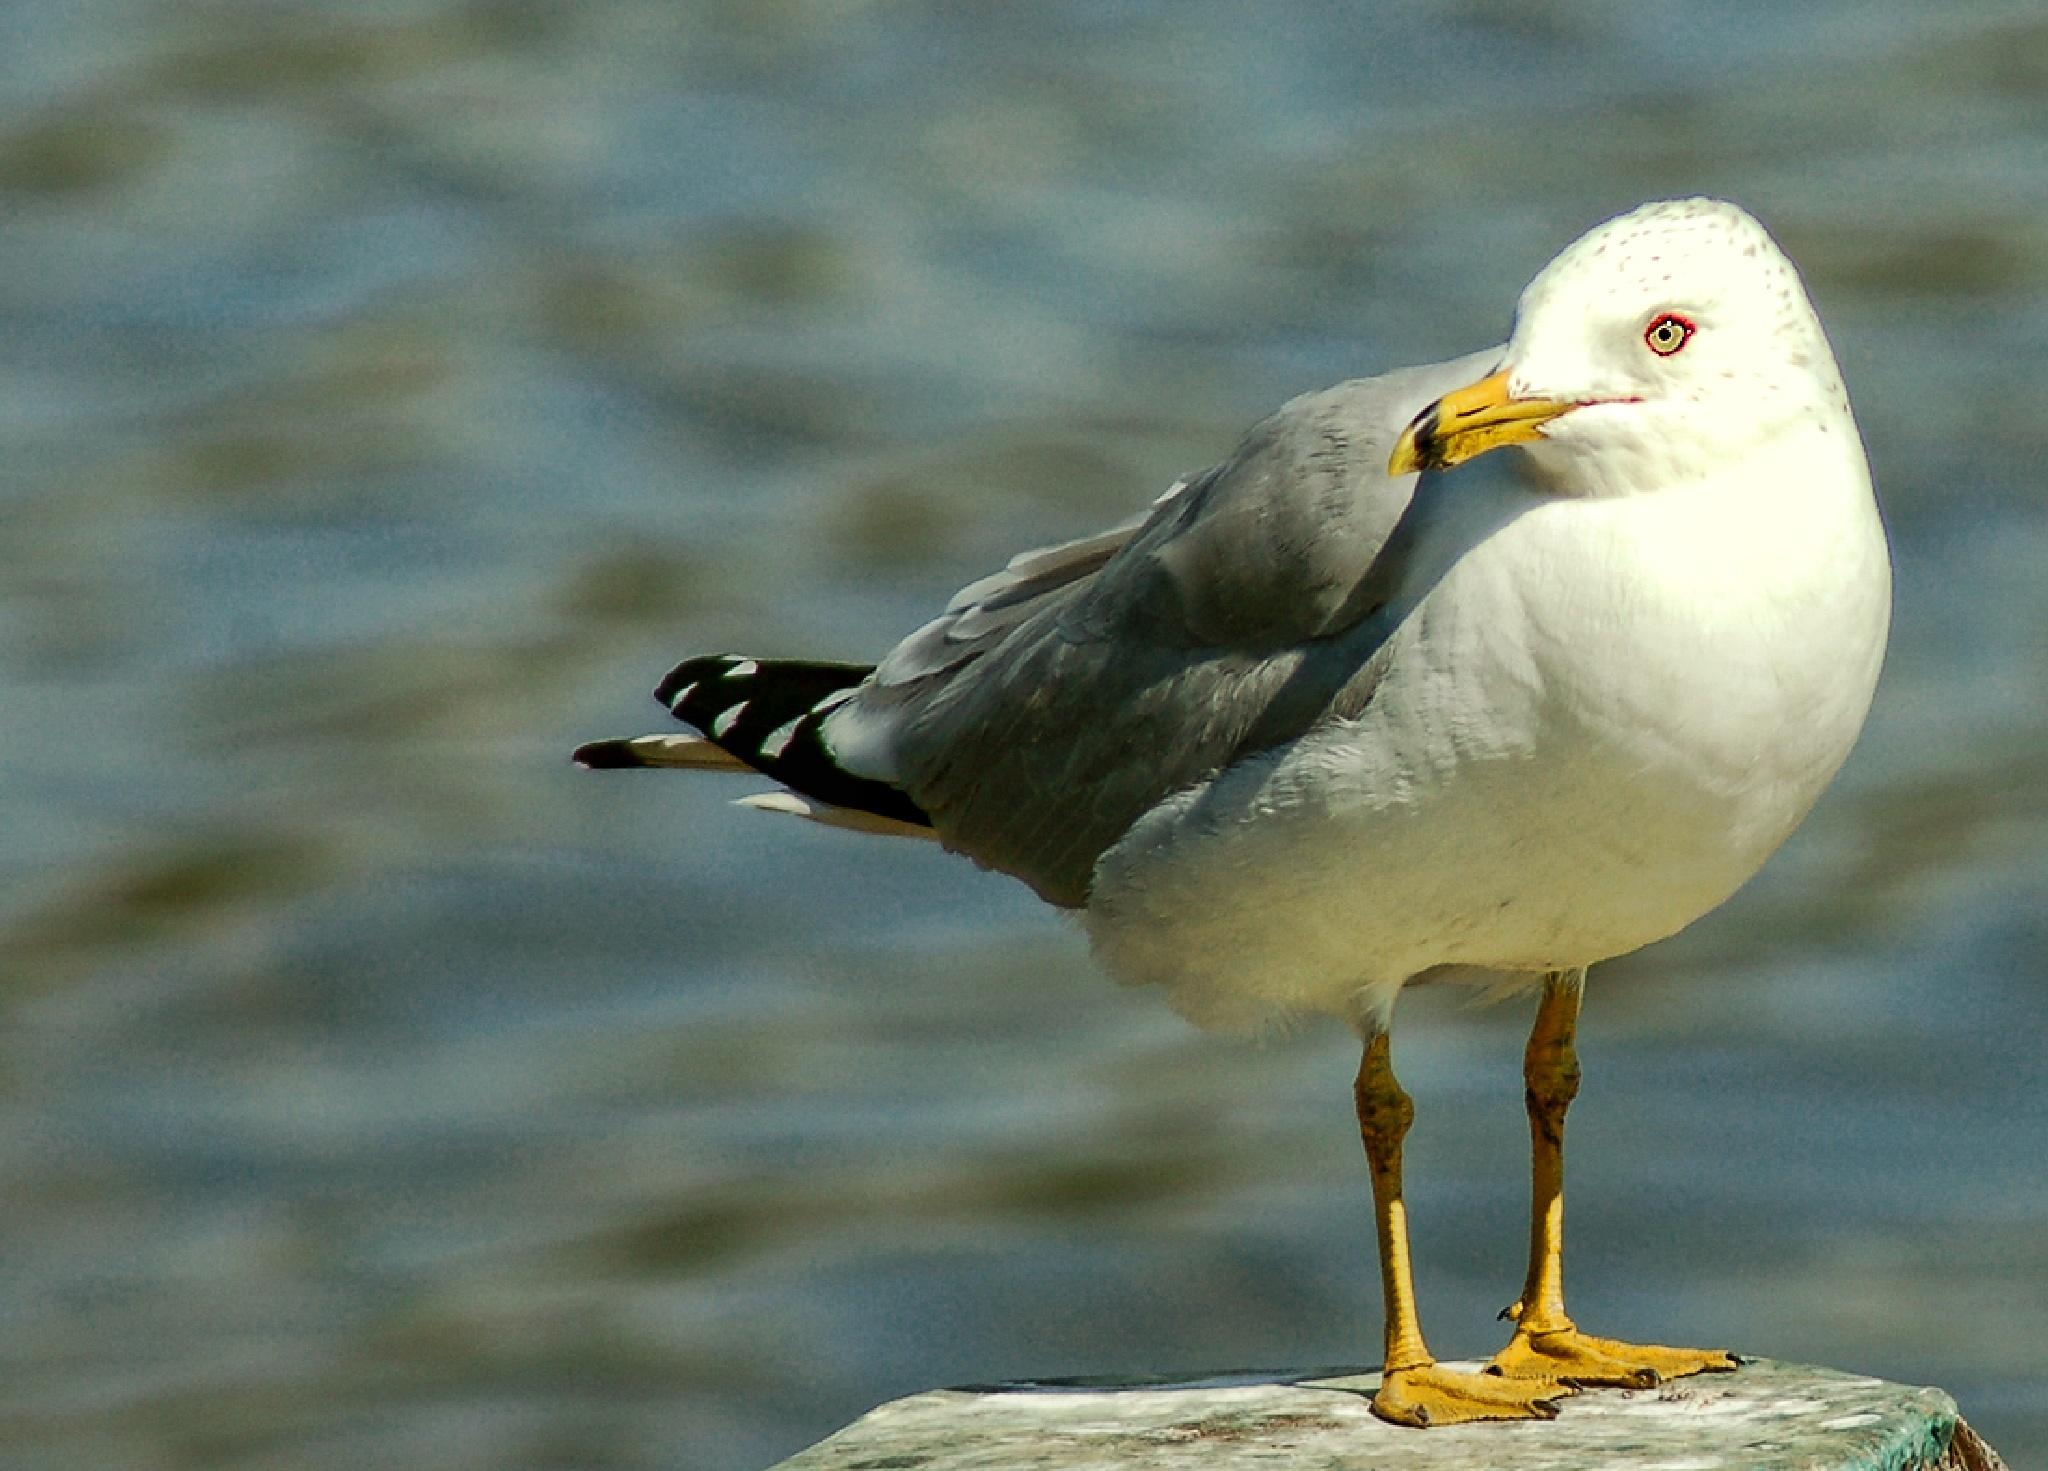 Bird on a post by Vonda B. Magill